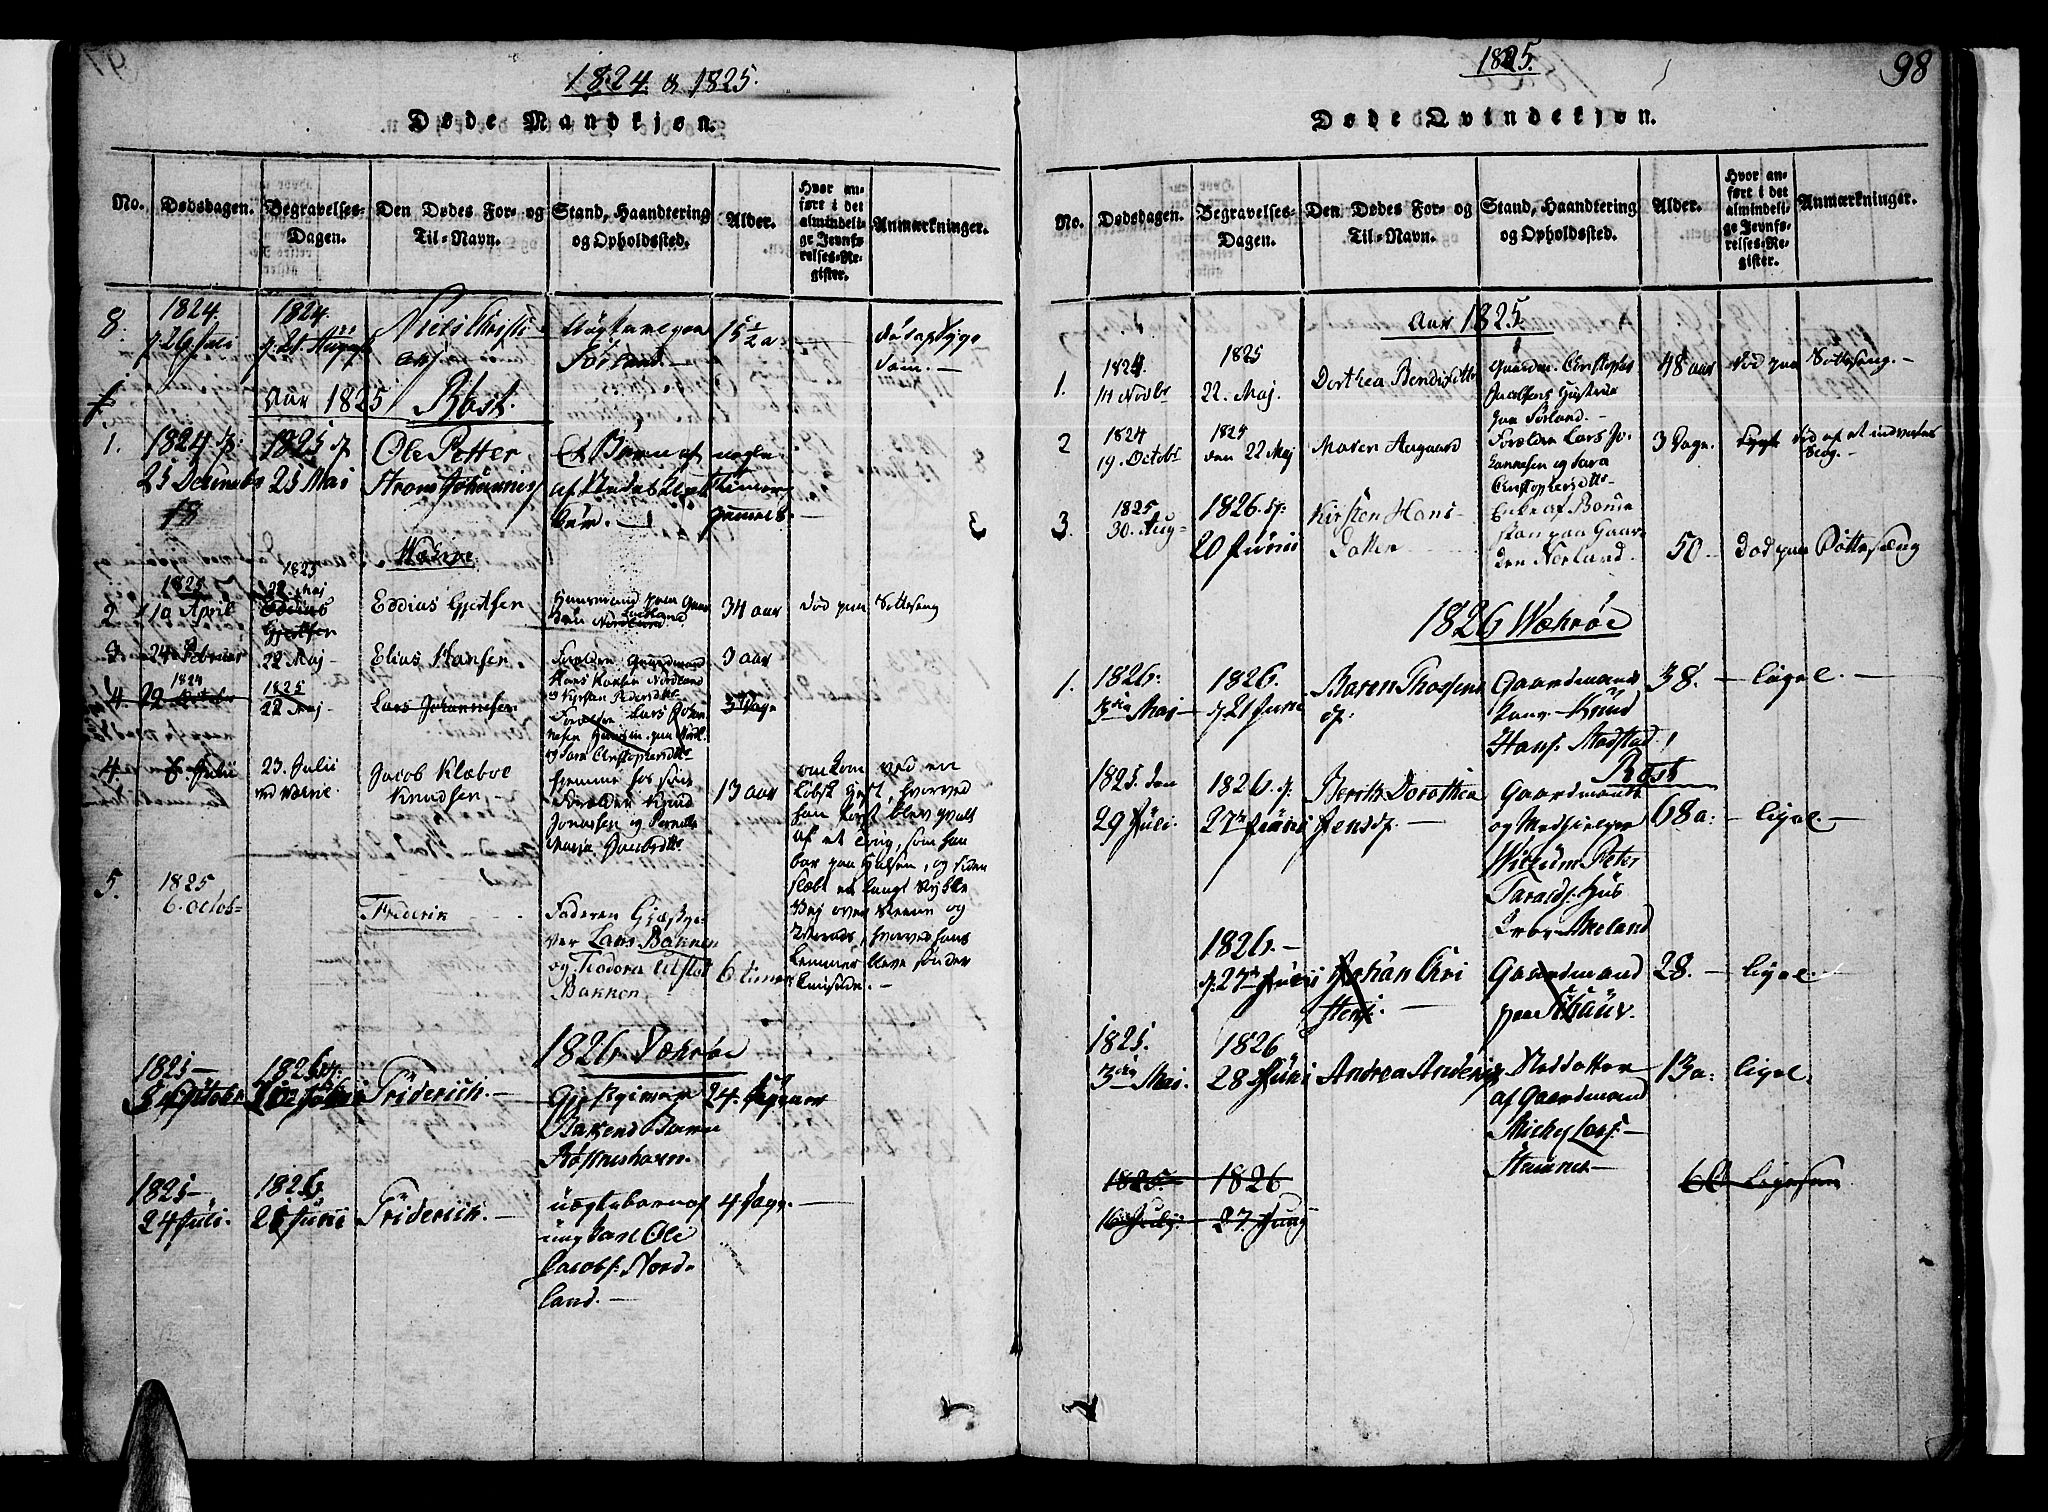 SAT, Ministerialprotokoller, klokkerbøker og fødselsregistre - Nordland, 807/L0120: Ministerialbok nr. 807A03, 1821-1848, s. 98